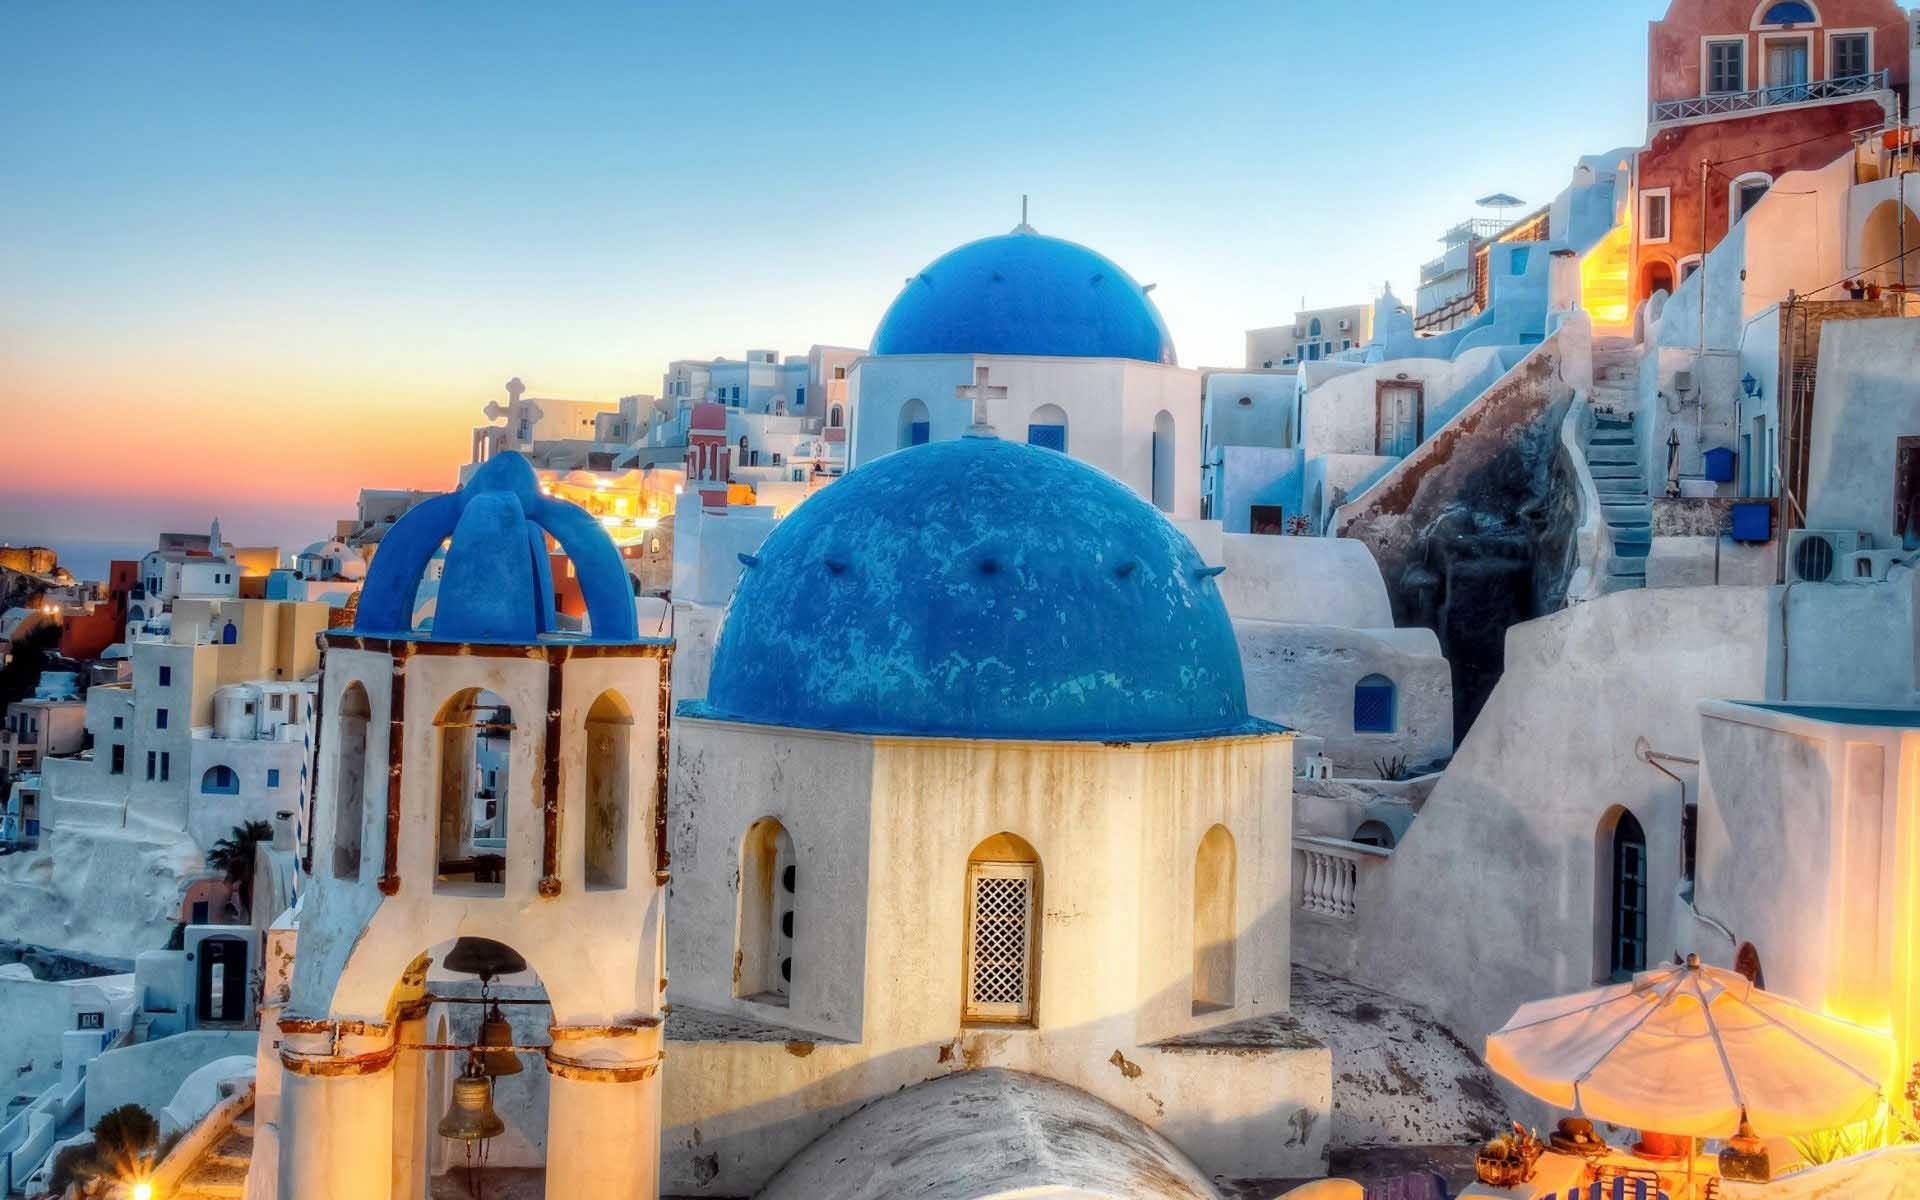 Res: 1920x1200, City Blue Domed Church On Greek Desktops Backgrounds Wallpaper